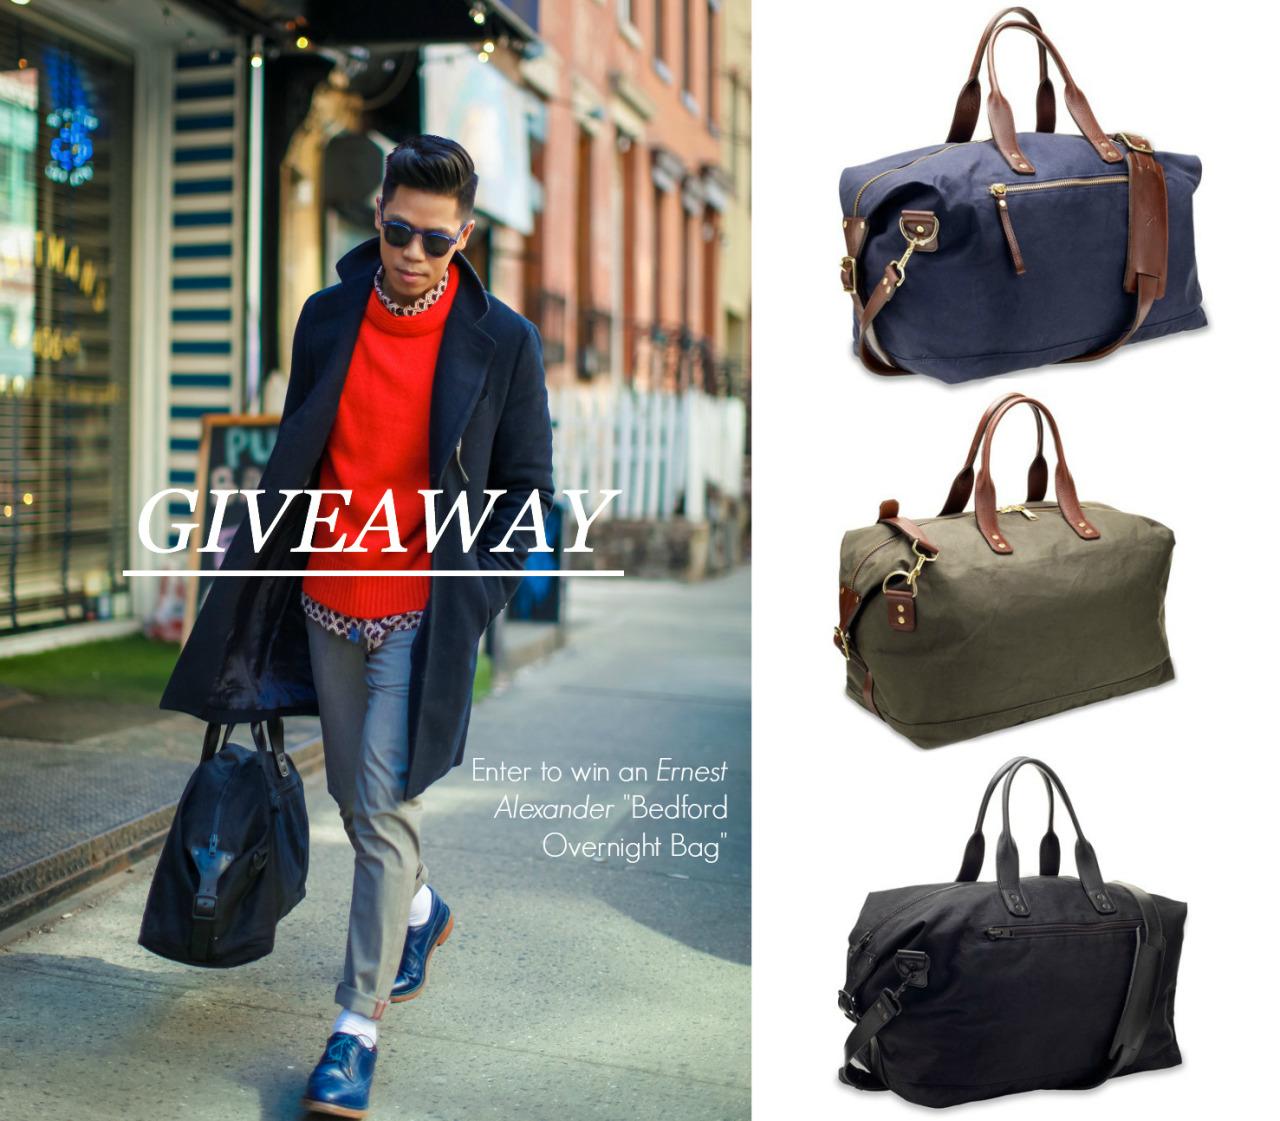 enter to win an Ernest Alexander Bedford overnight bag